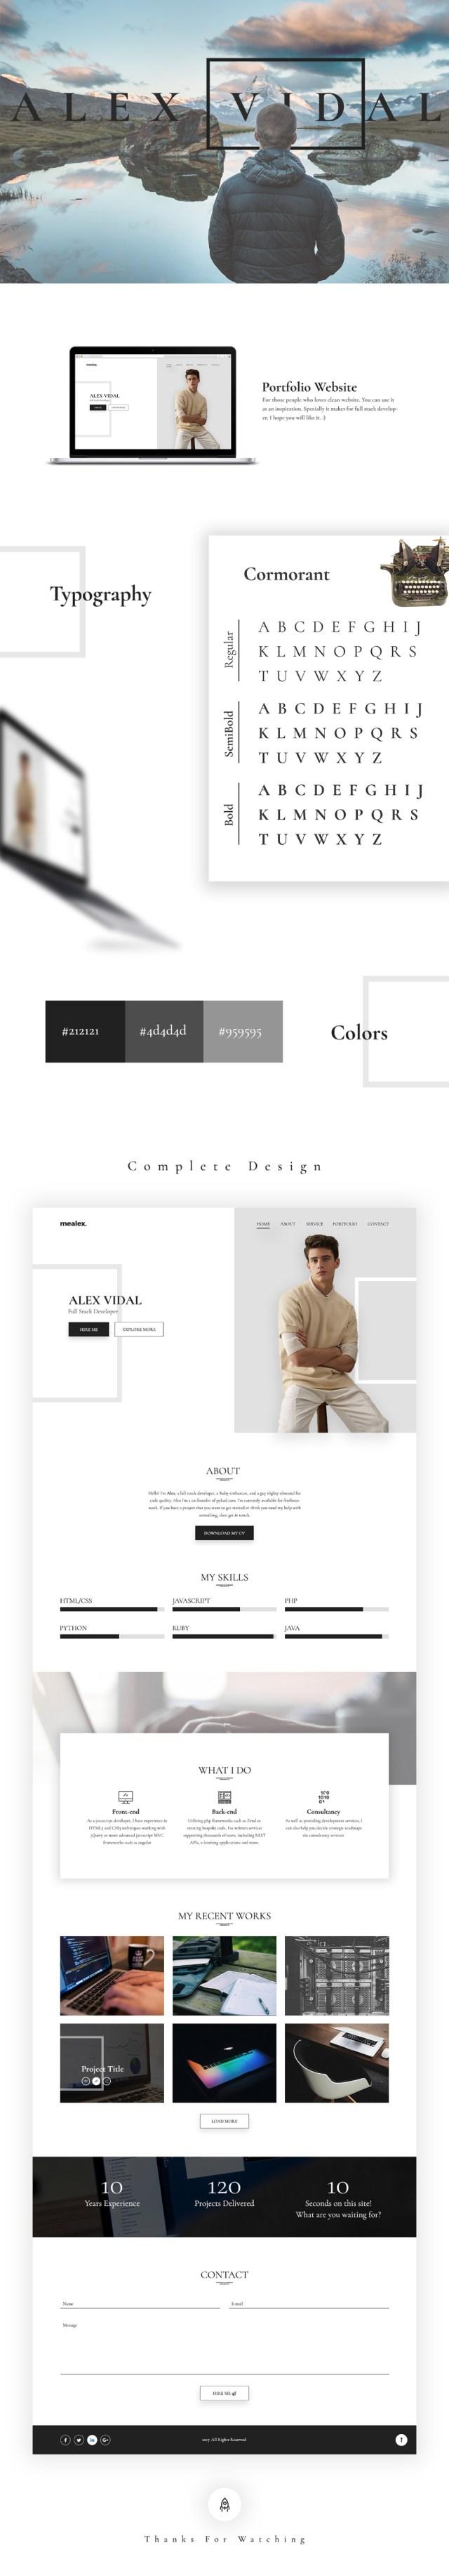 Alex Free Personal Portfolio Template